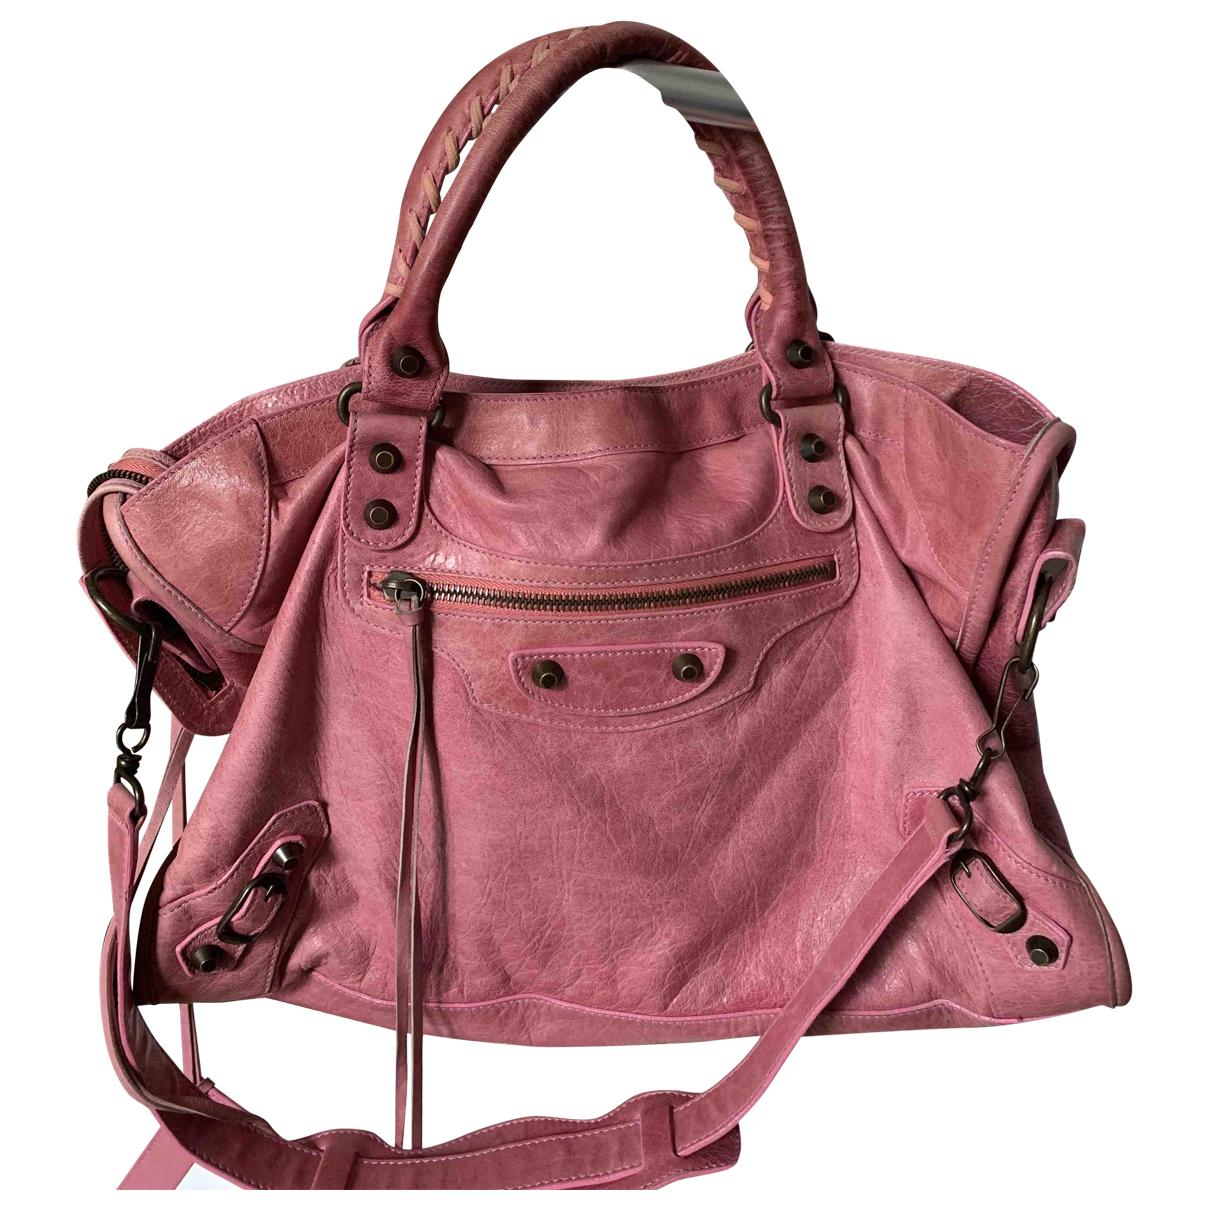 Balenciaga Work Handtasche in  Rosa Leder